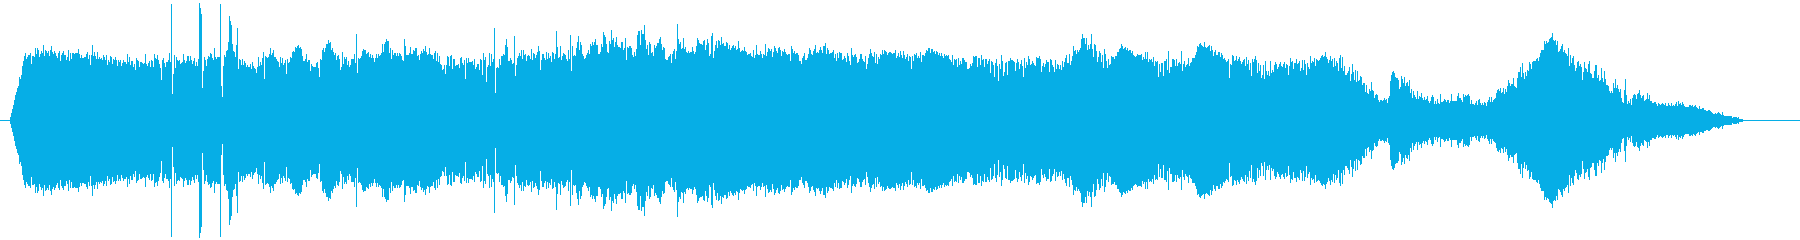 GTSカー;アウェイ(数)アウェイ...の再生済みの波形